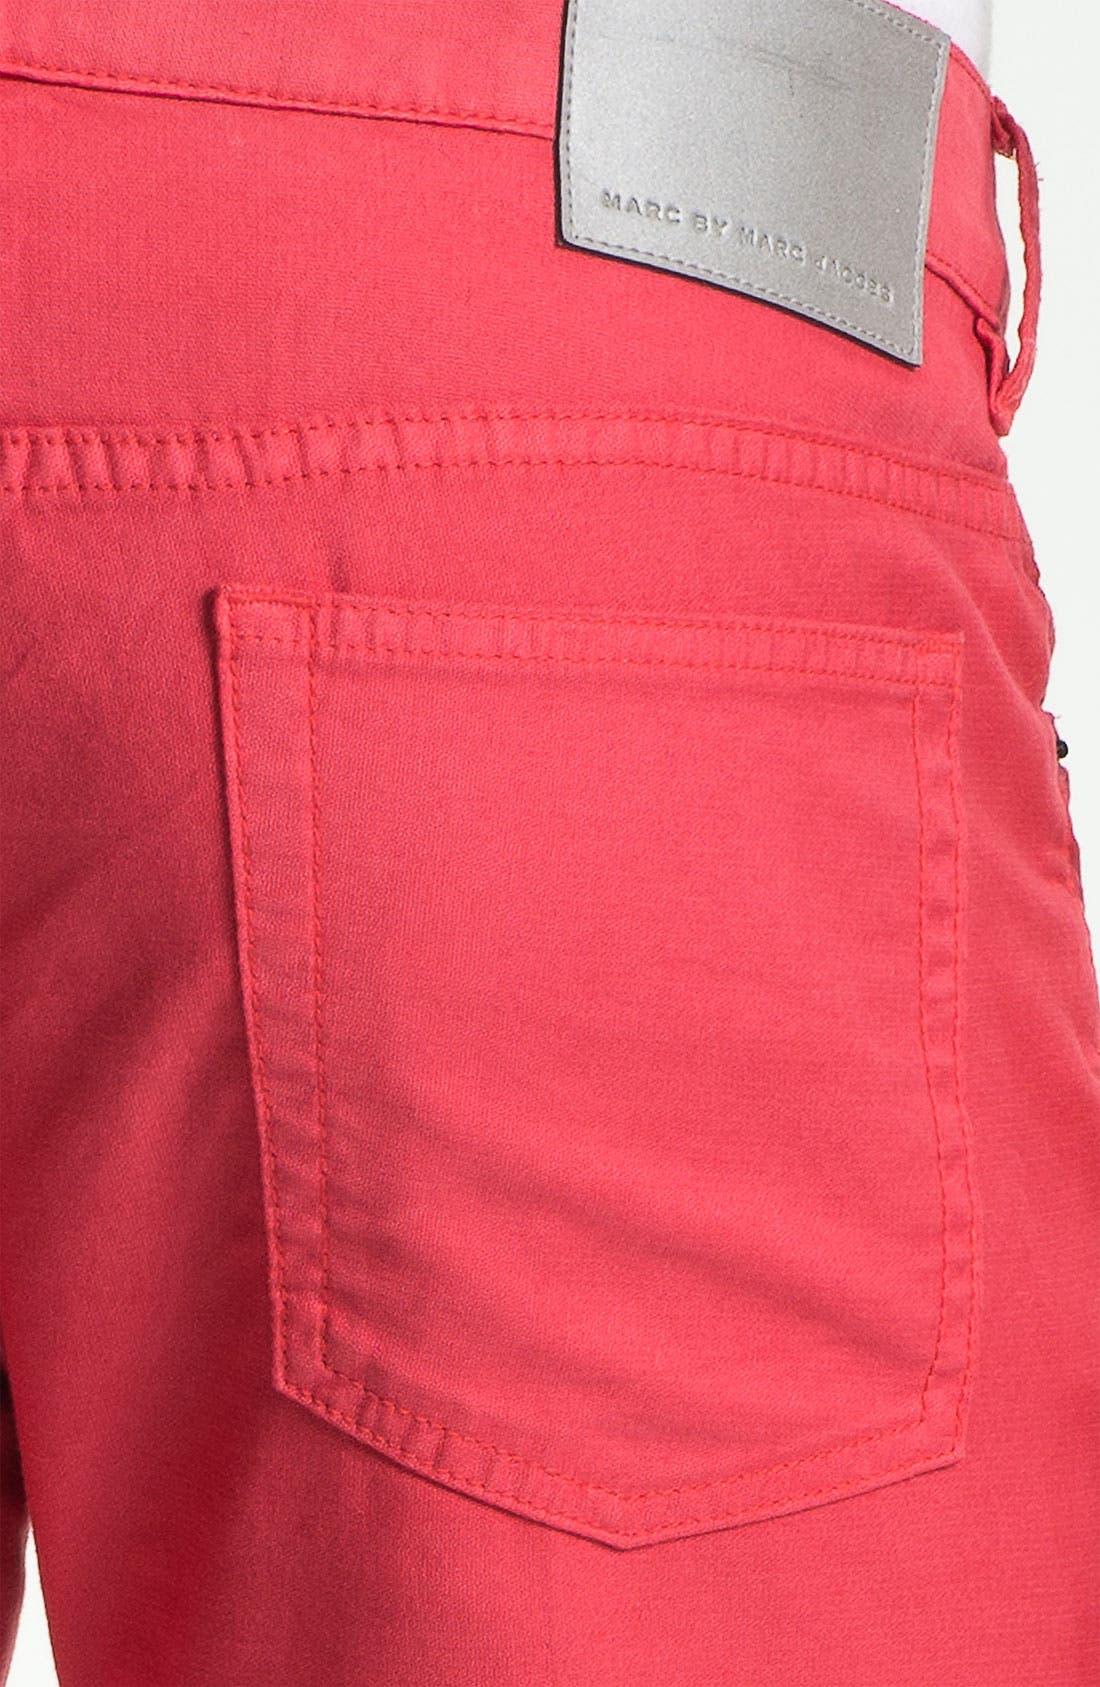 Alternate Image 3  - MARC BY MARC JACOBS Slim Straight Leg Pants